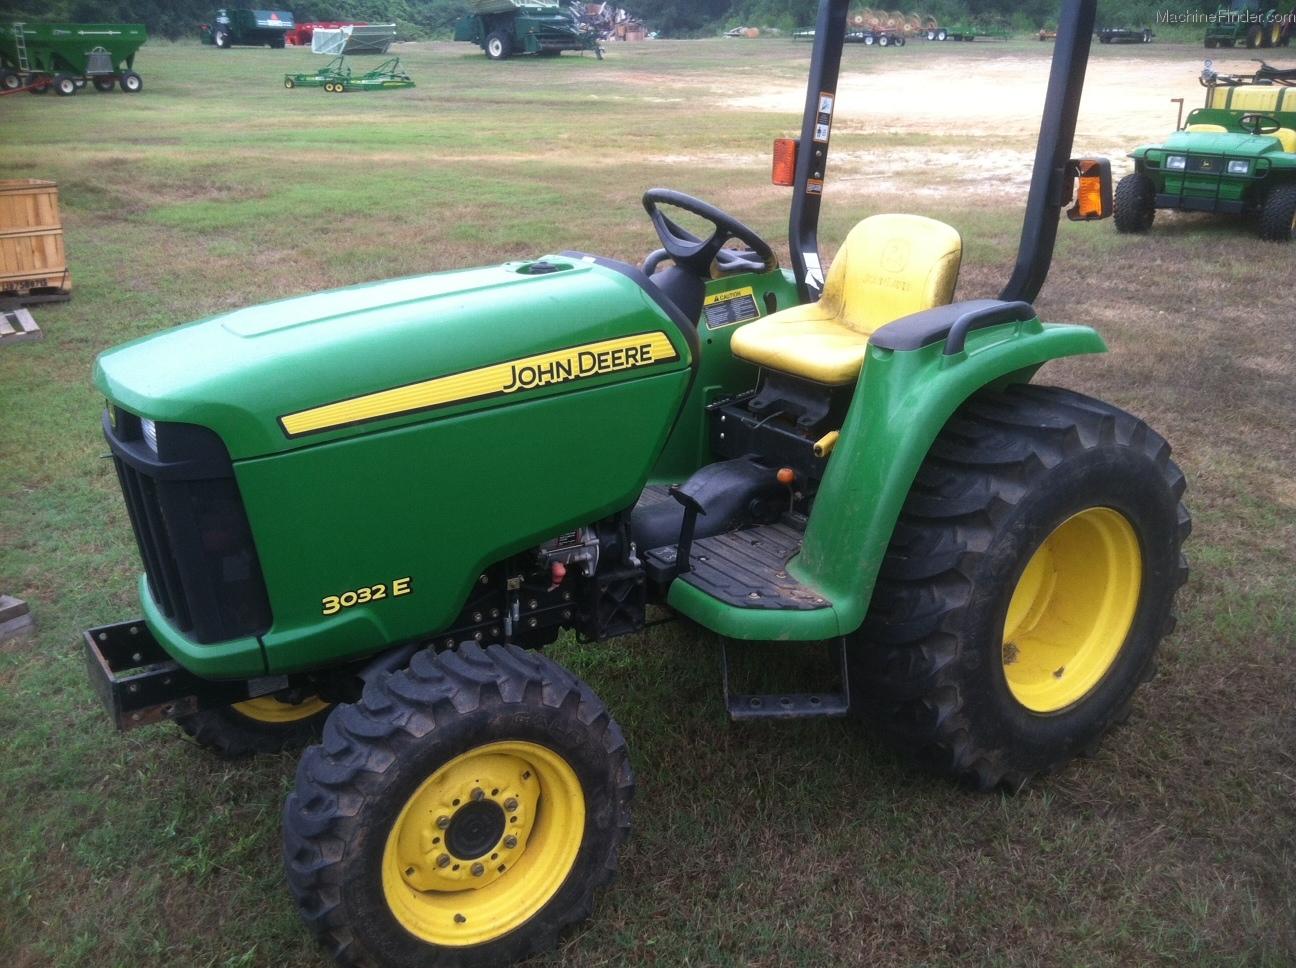 2010 John Deere 3032E Tractors - Compact (1-40hp.) - John ...